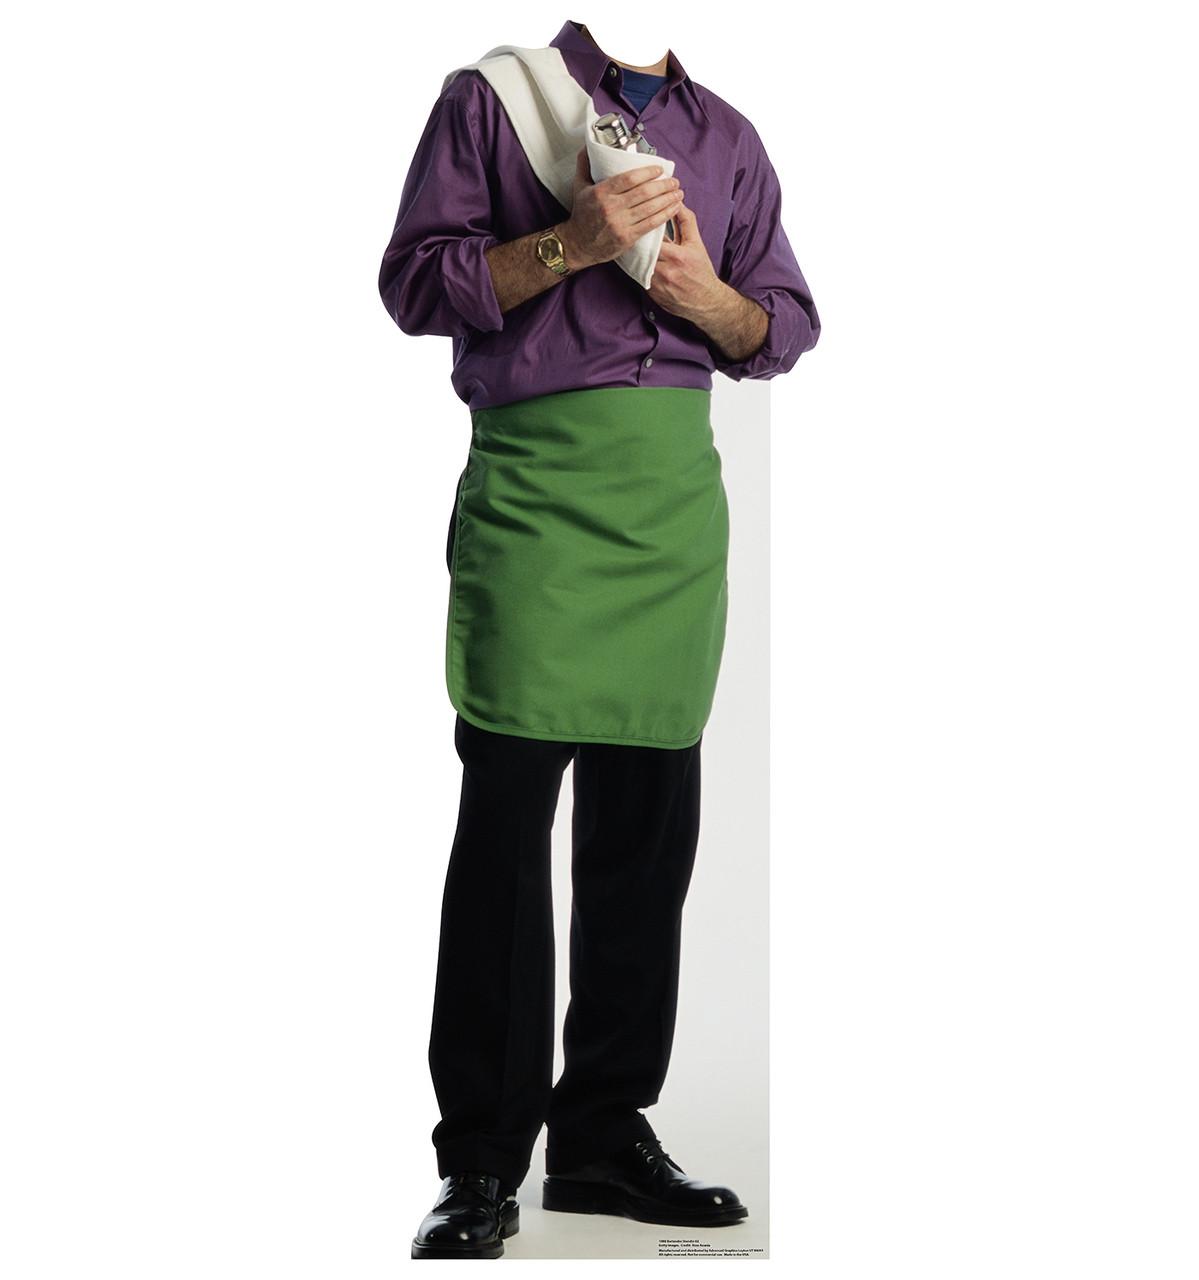 Green Apron Bartender Standin